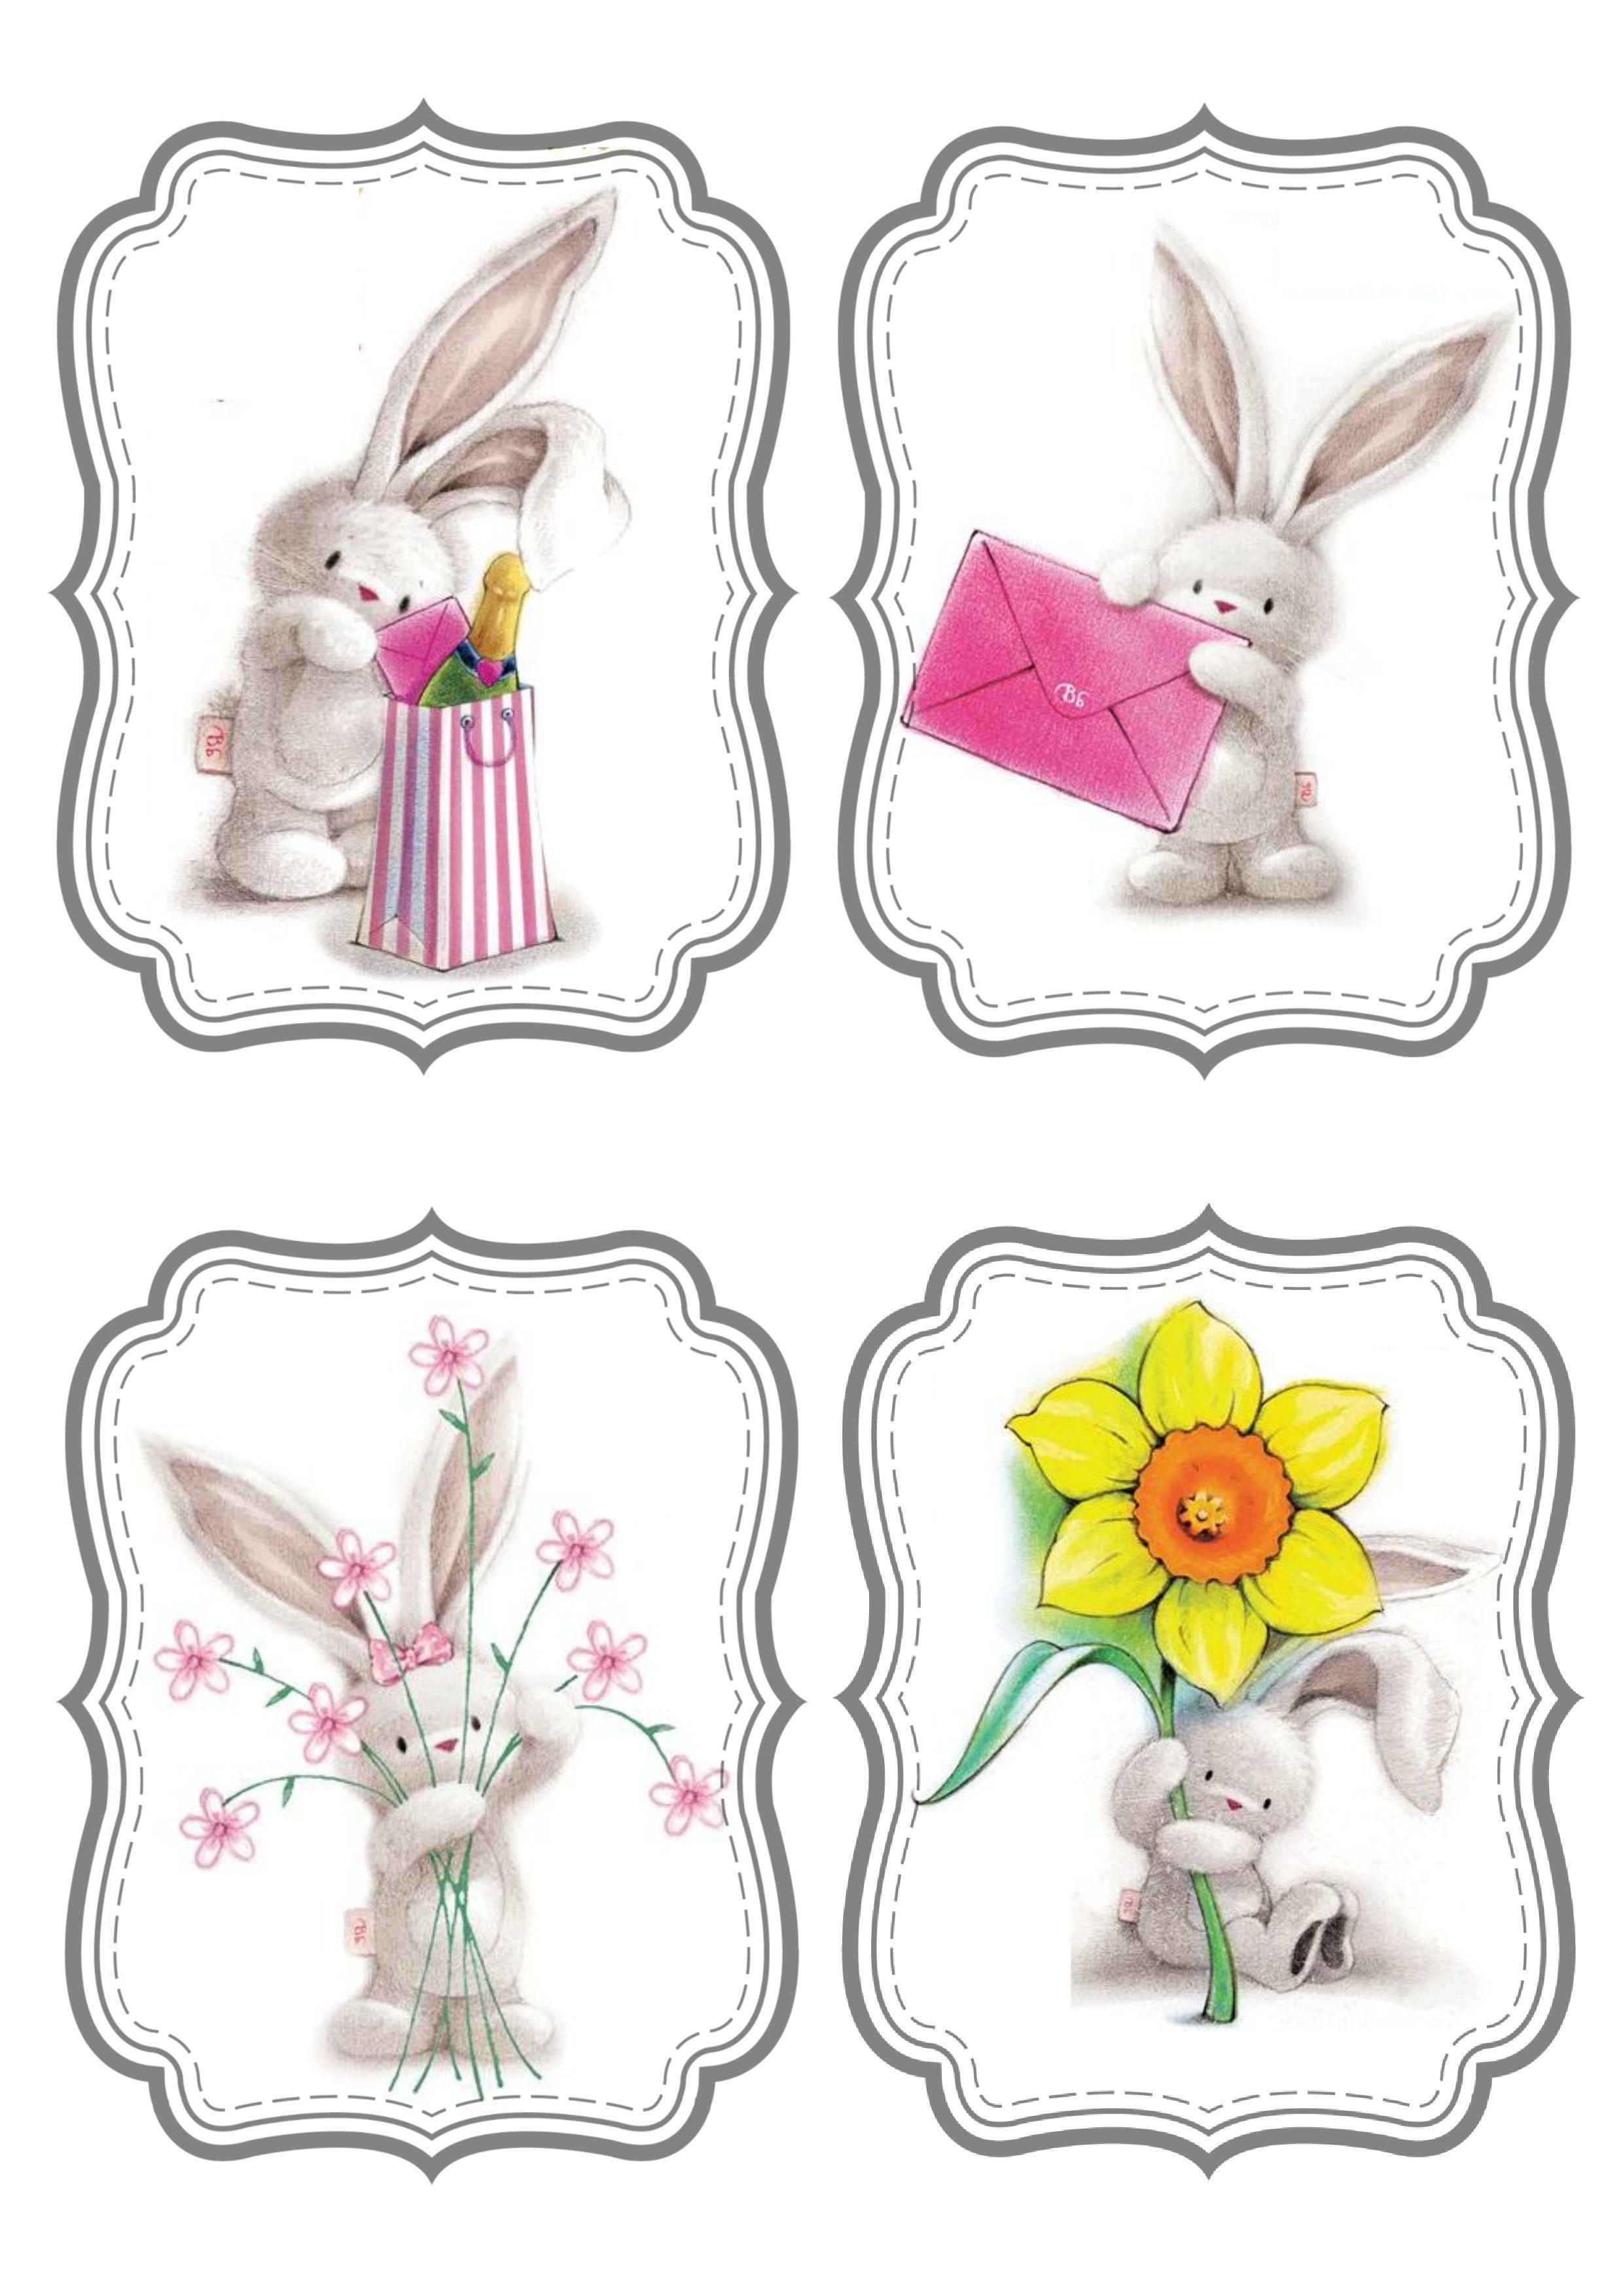 Cute tags for Mason jars | Мишки, Зайки и другие | Pinterest ...